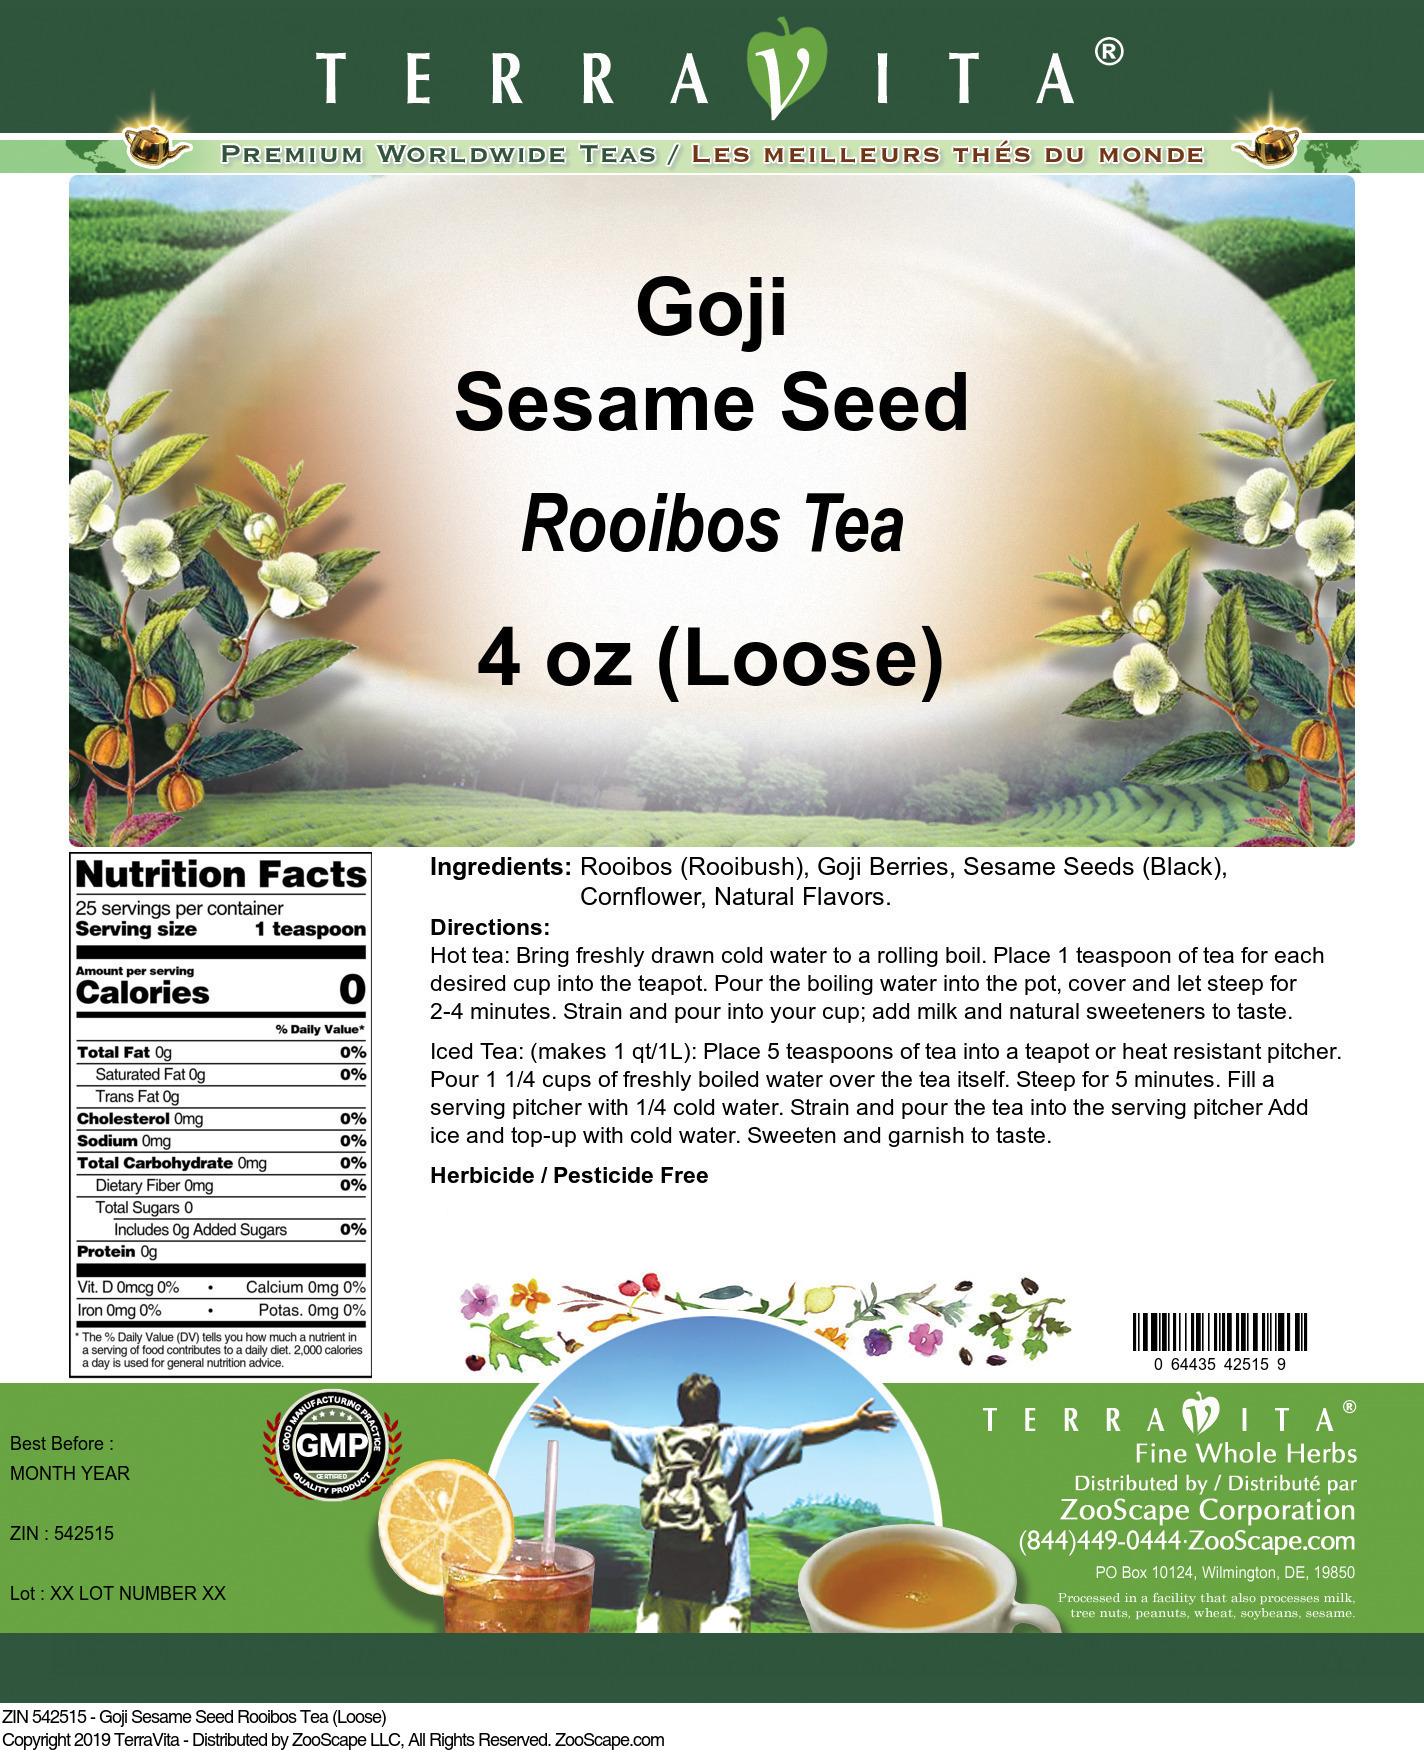 Goji Sesame Seed Rooibos Tea